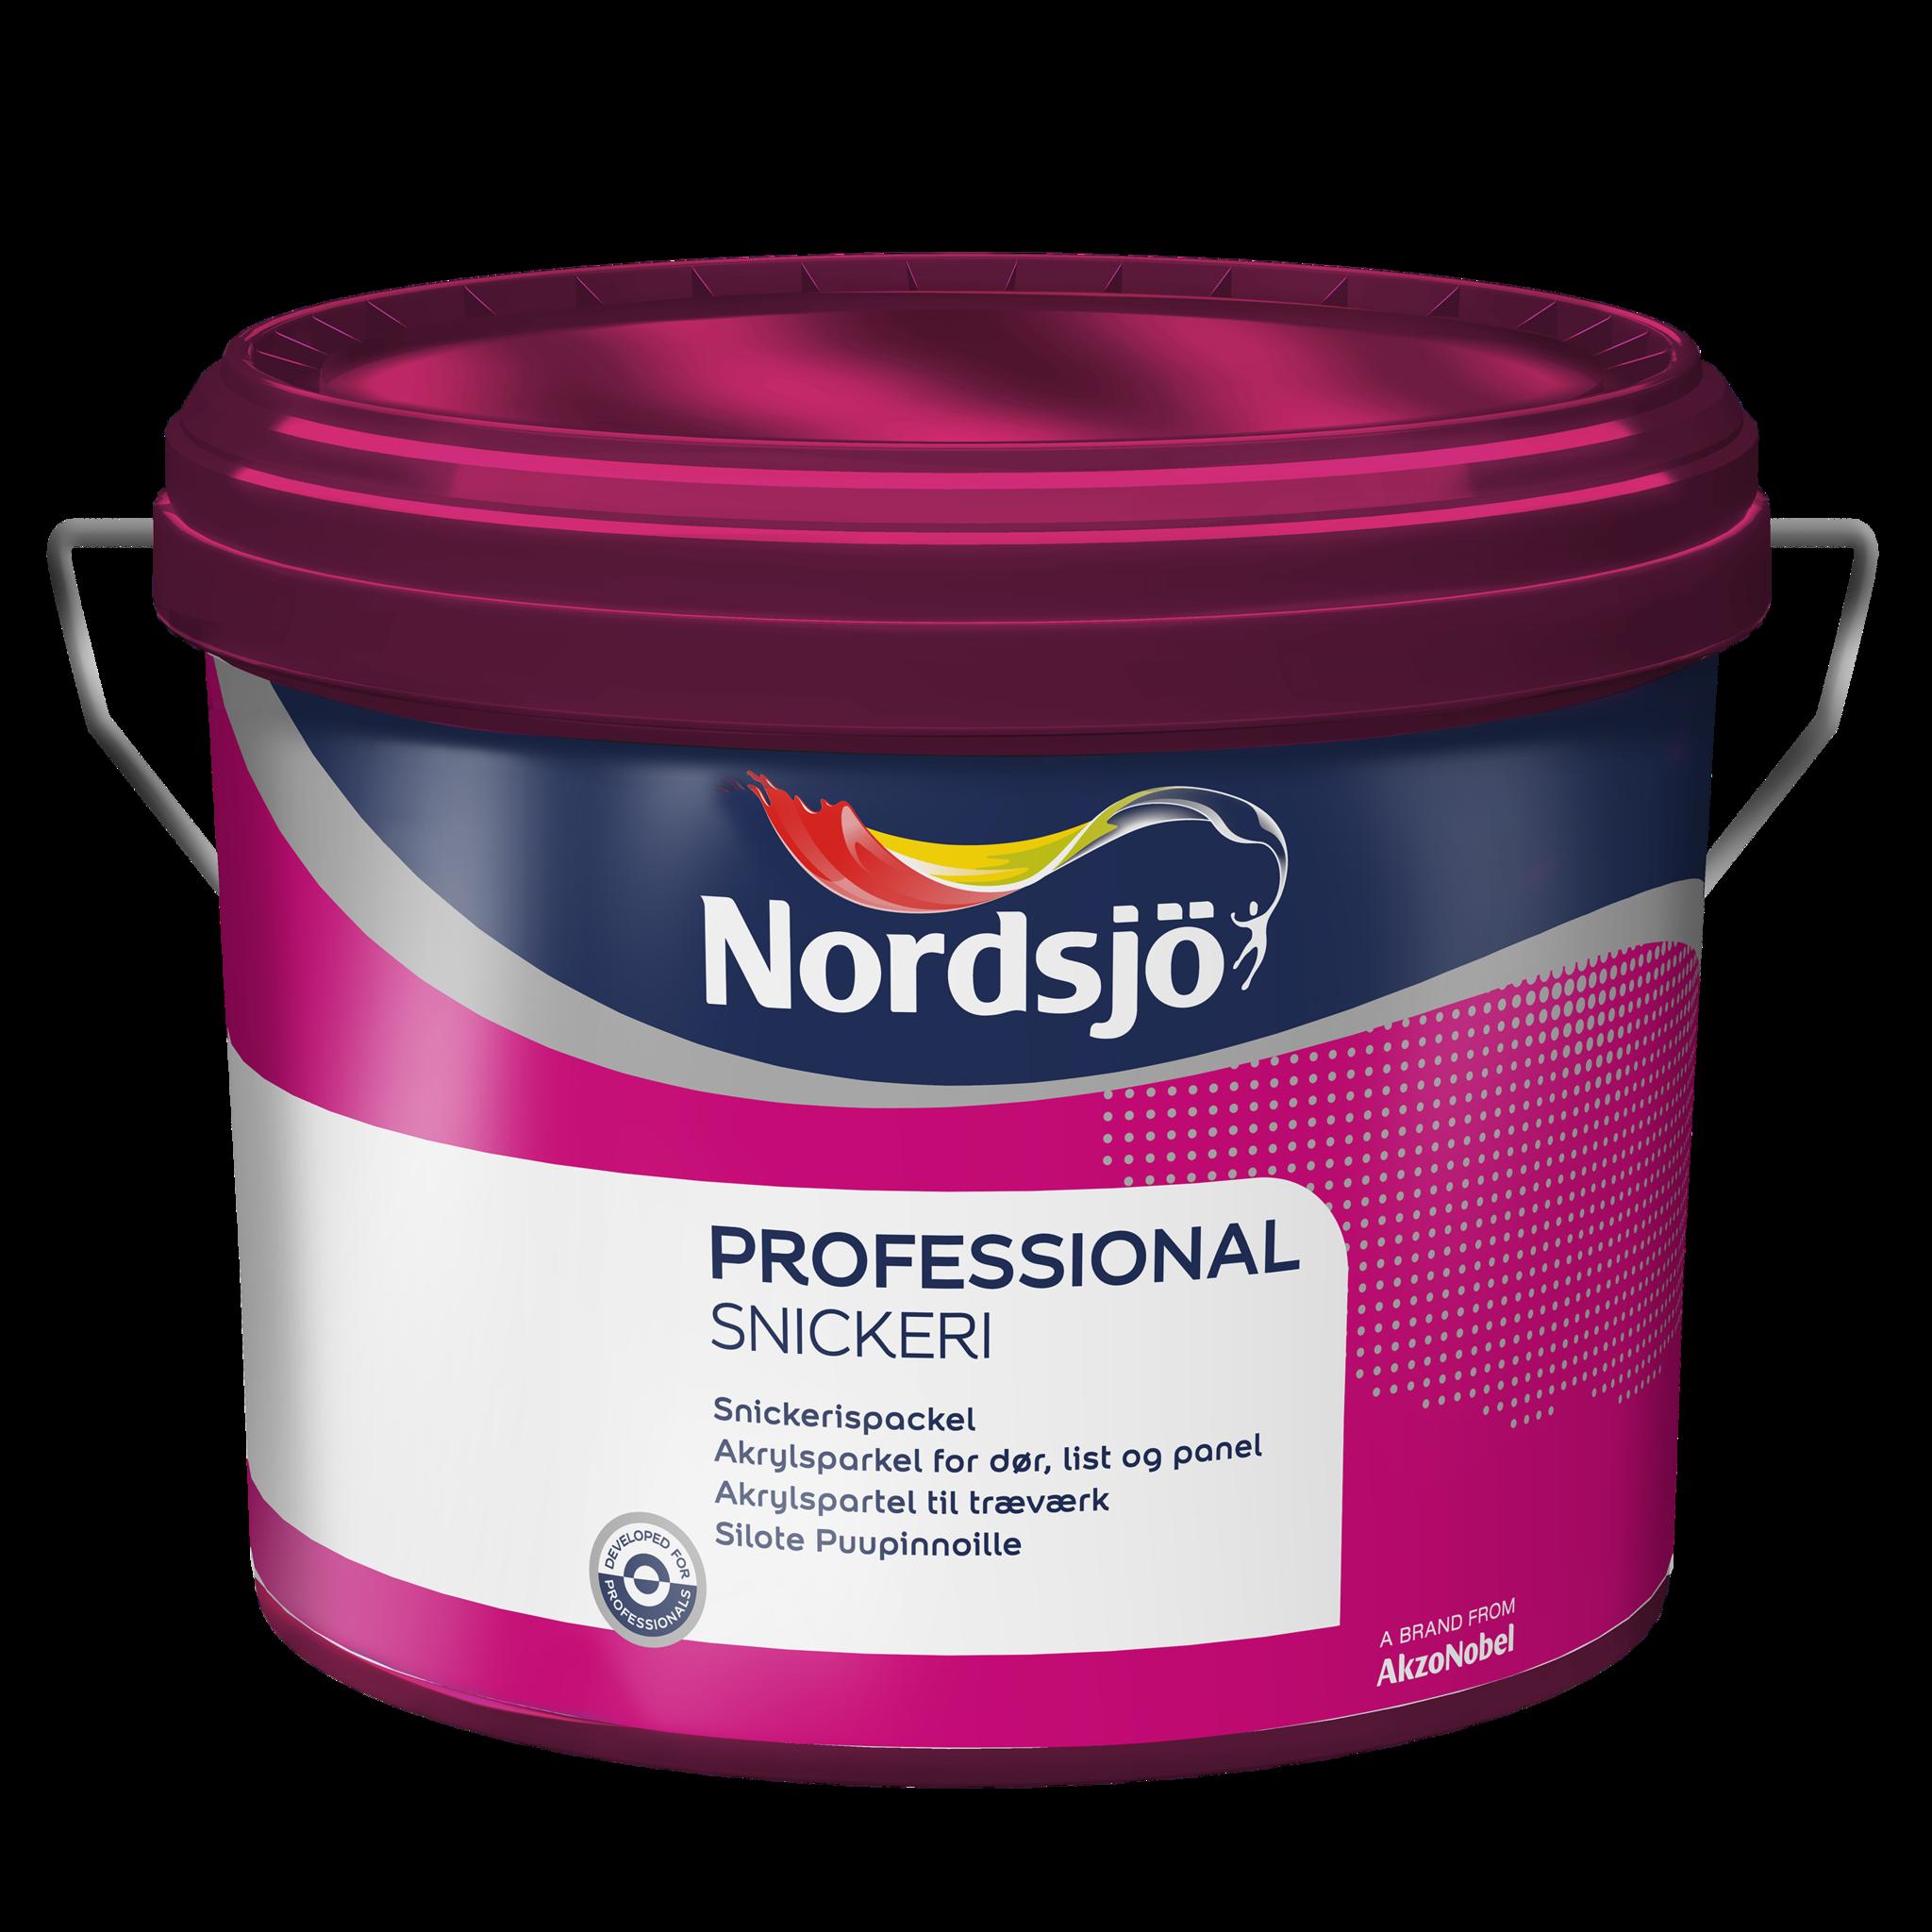 Nordsjö Professional Snickerispackel